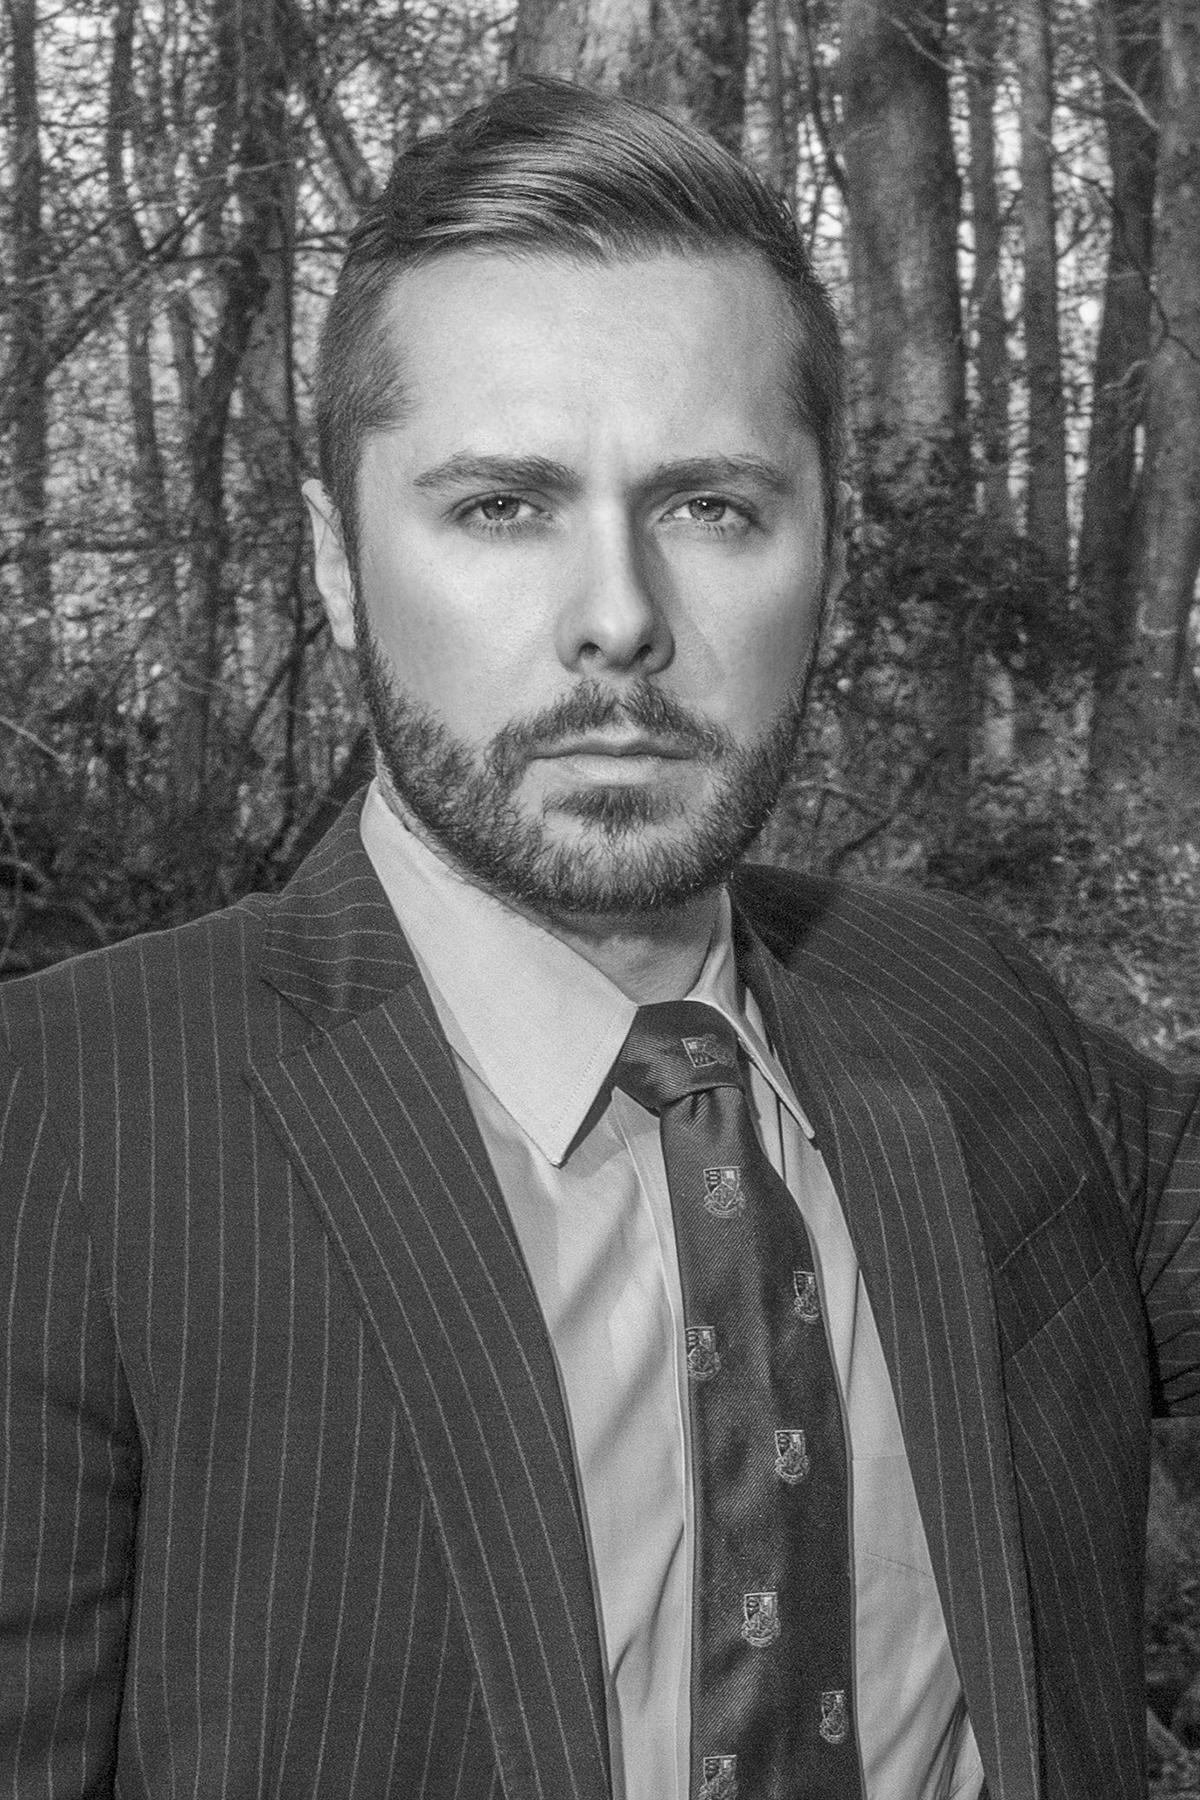 Ian Isbitski